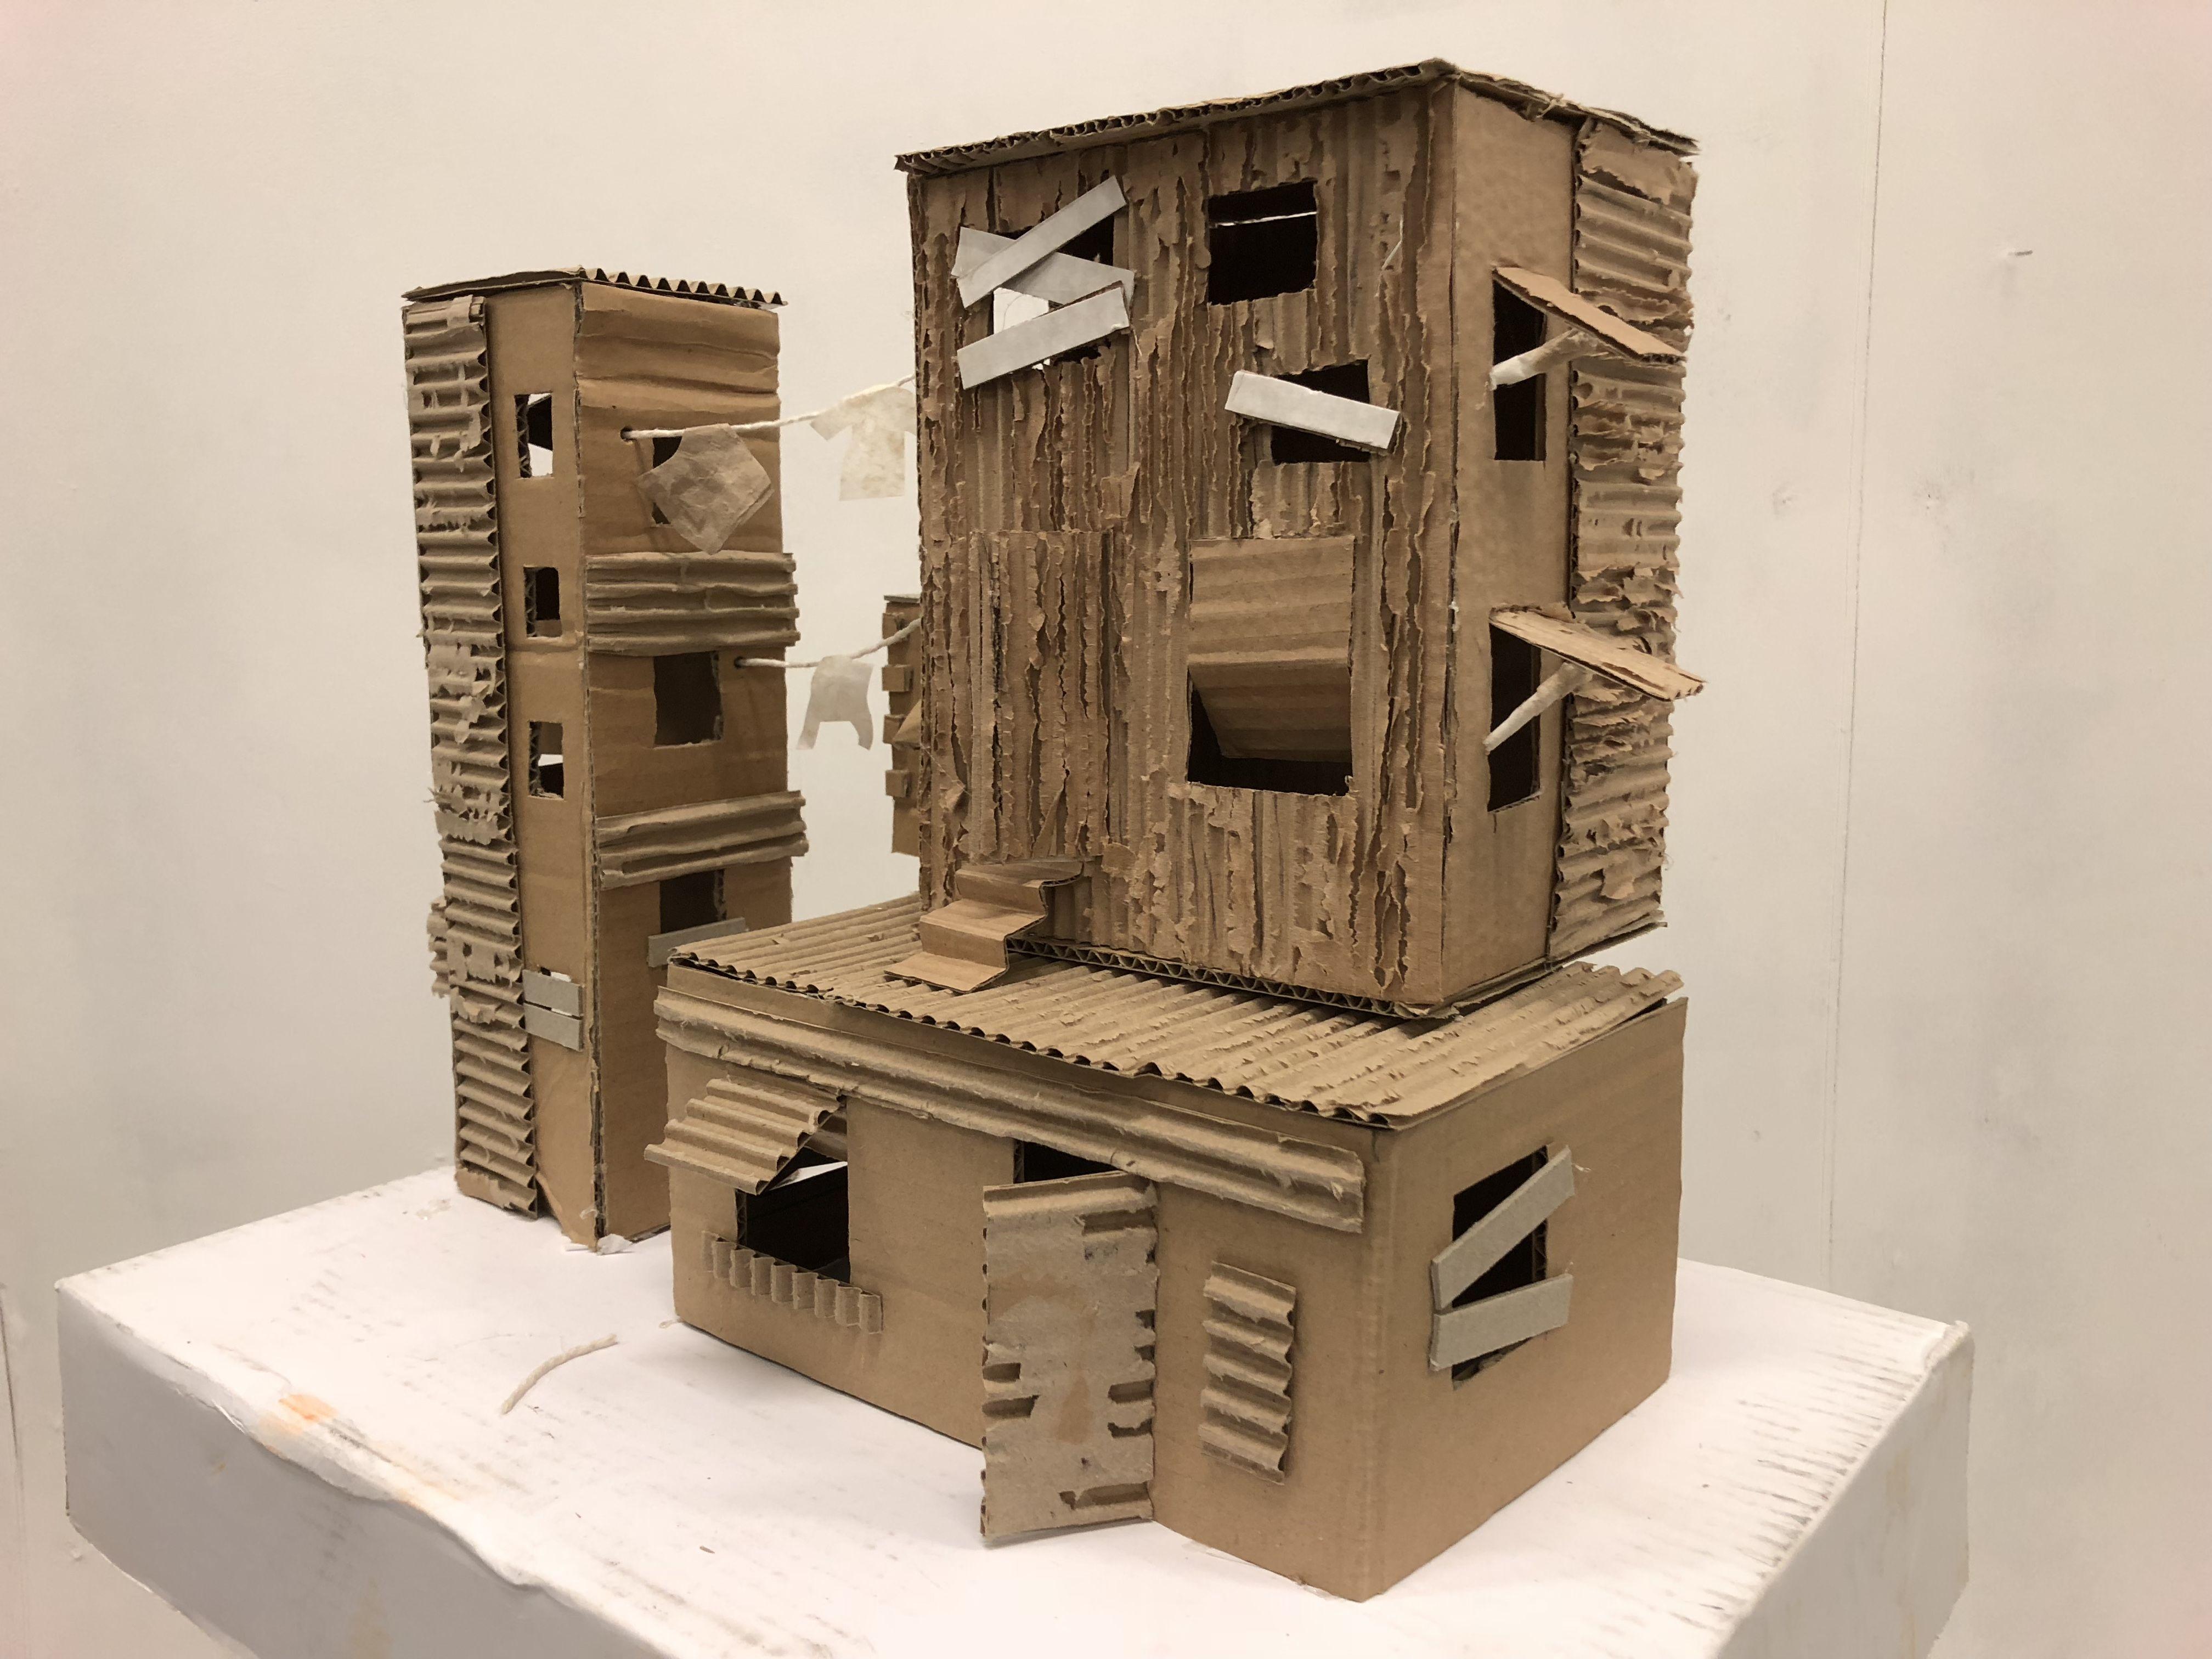 Cardboard Favela Housing Architecture Model Sculpture